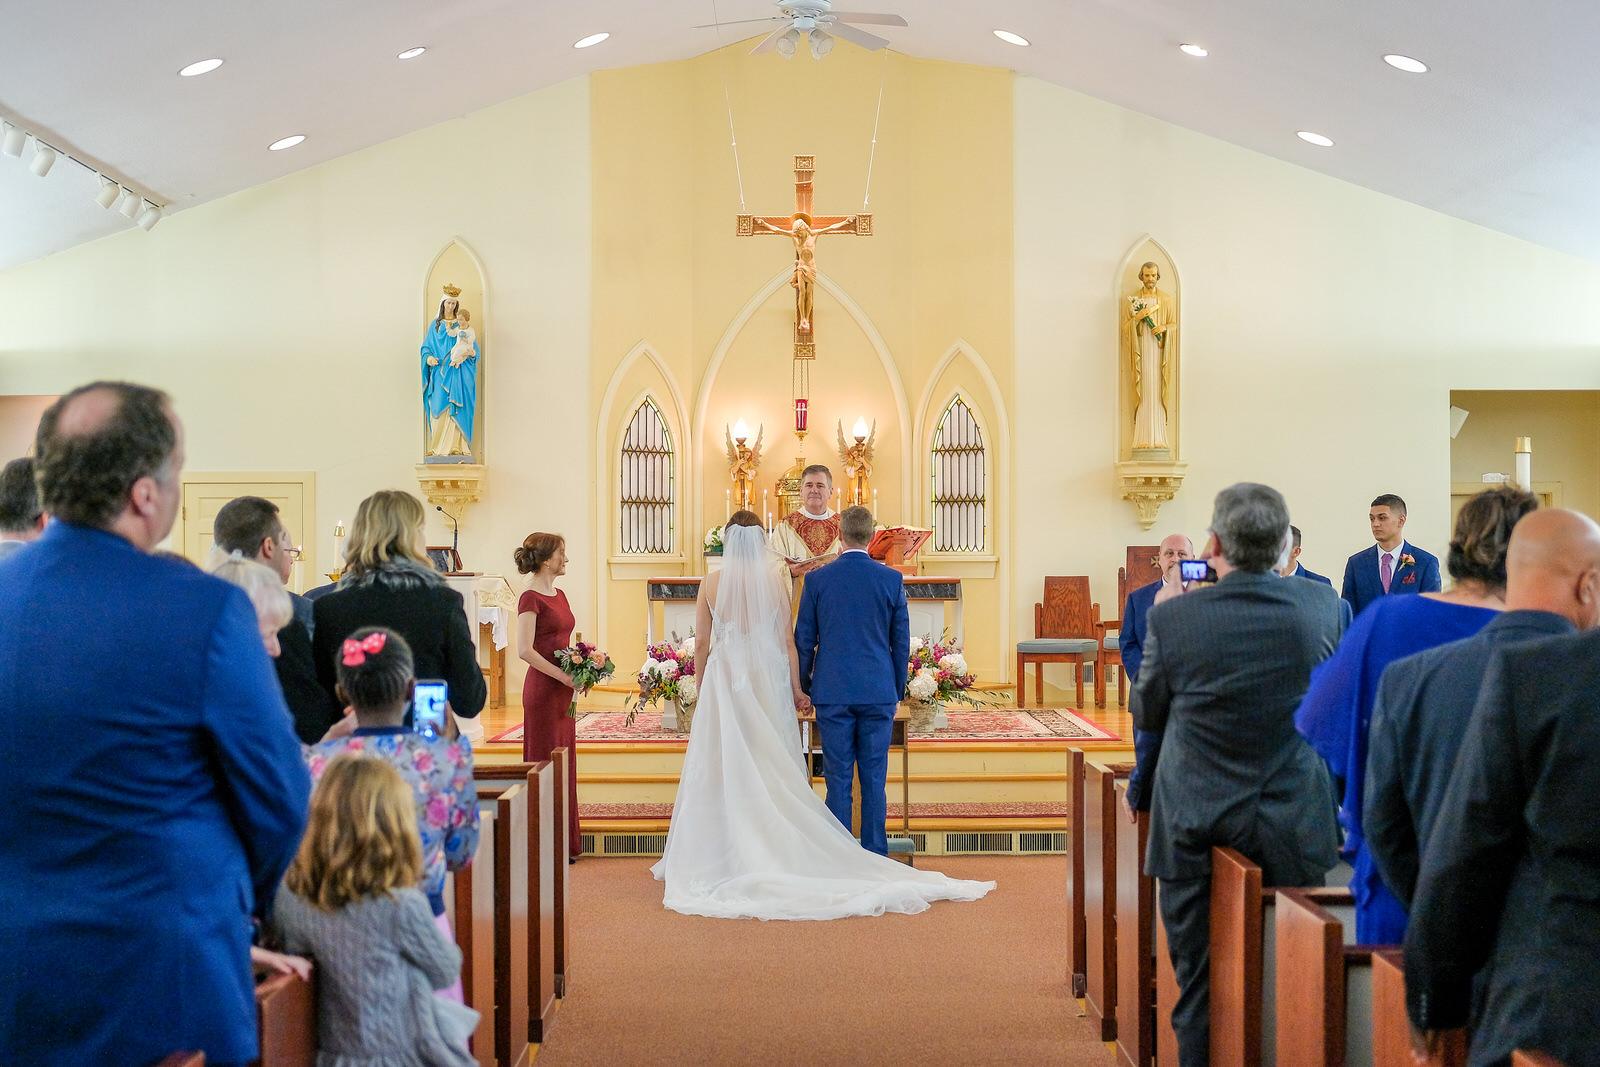 Zorvino-Vineyards-Fall-Wedding-Photography-250.jpg